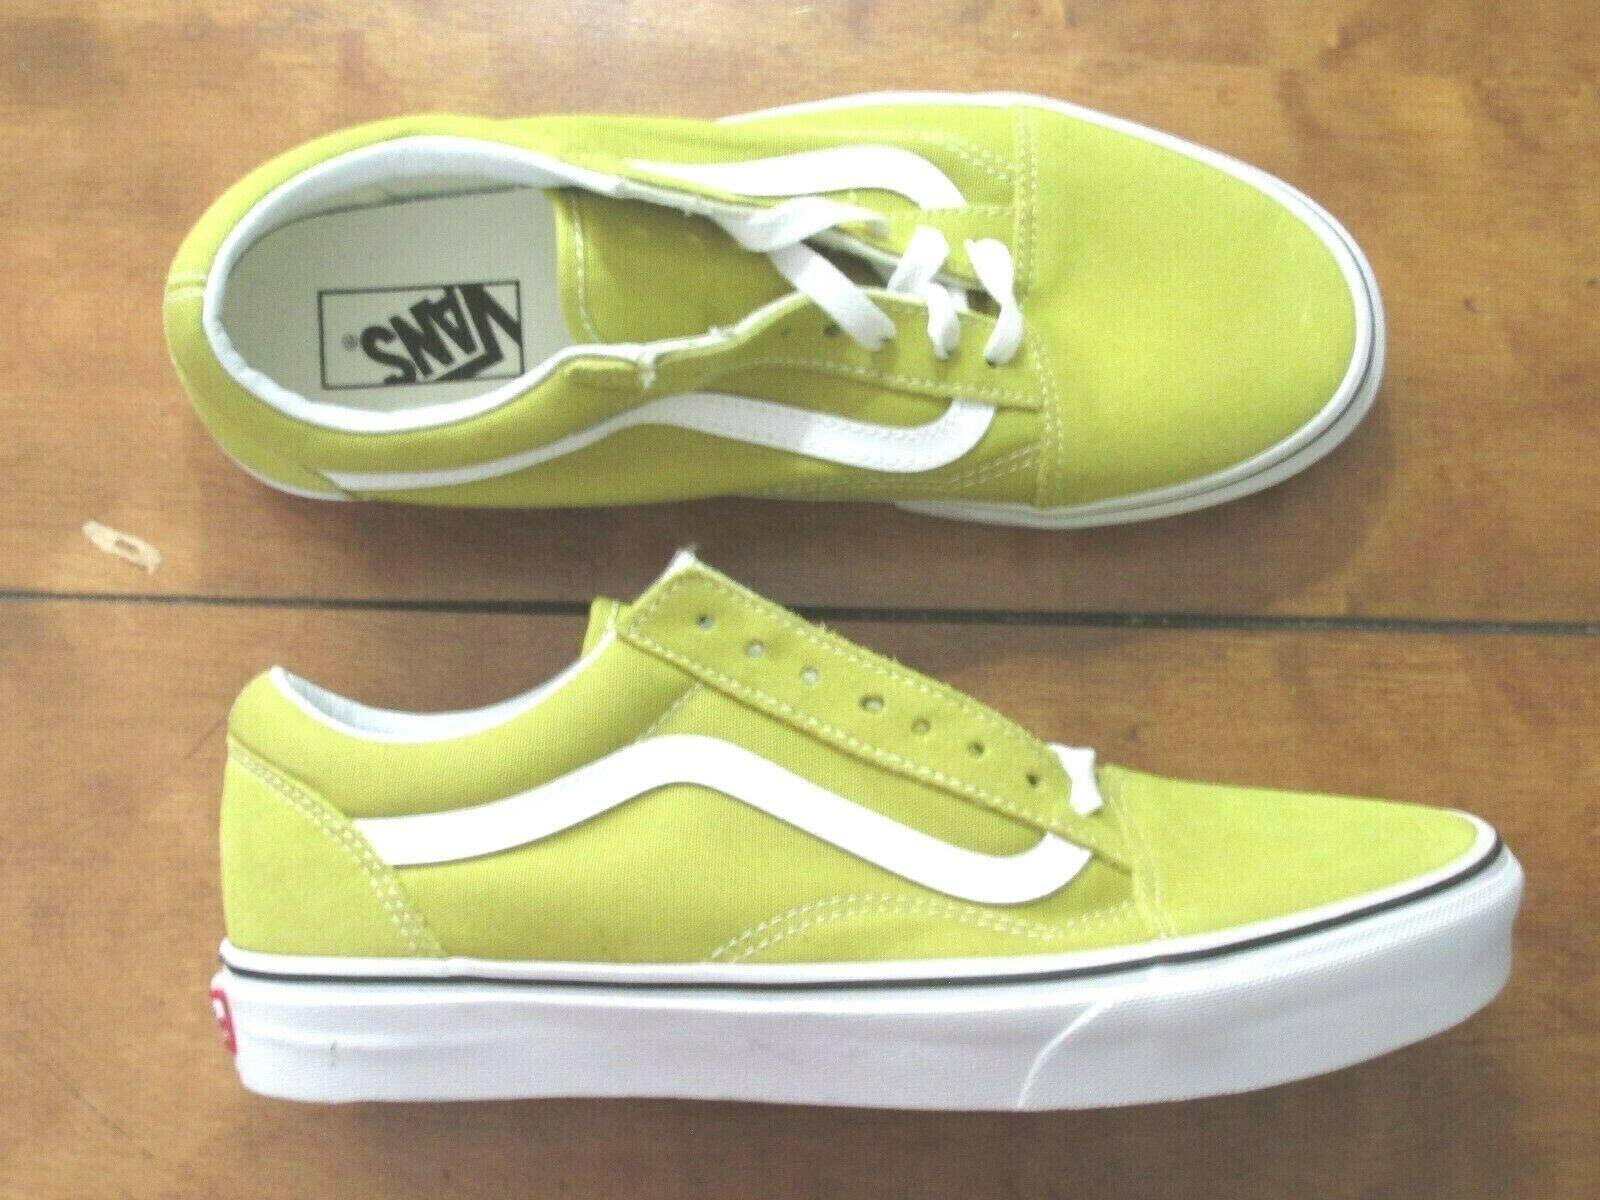 Men's Vans shoes old skool Canvas Suede color Mustard  Size 9.